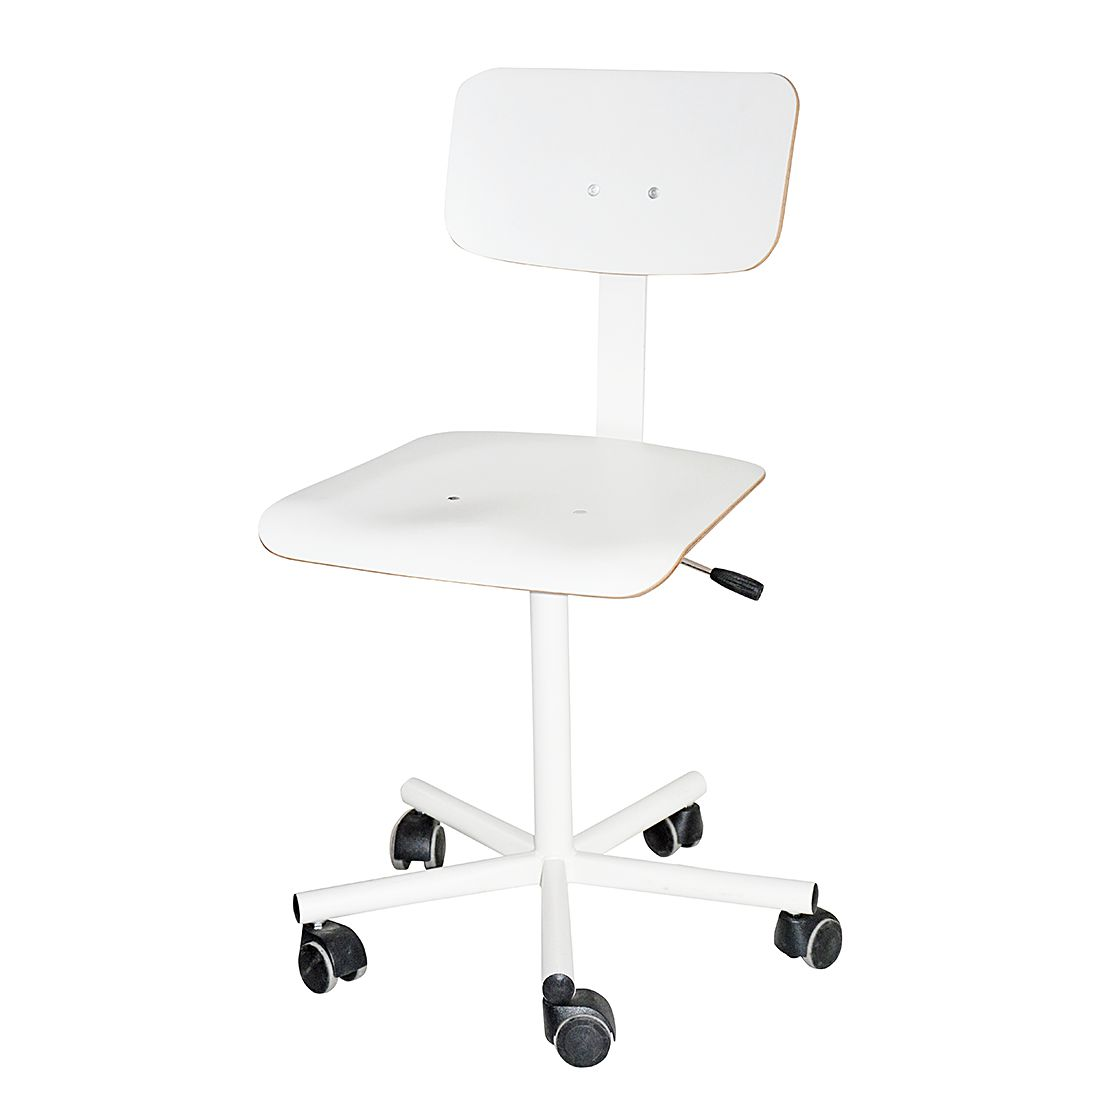 Home 24 - Chaise de bureau ella, reinhard